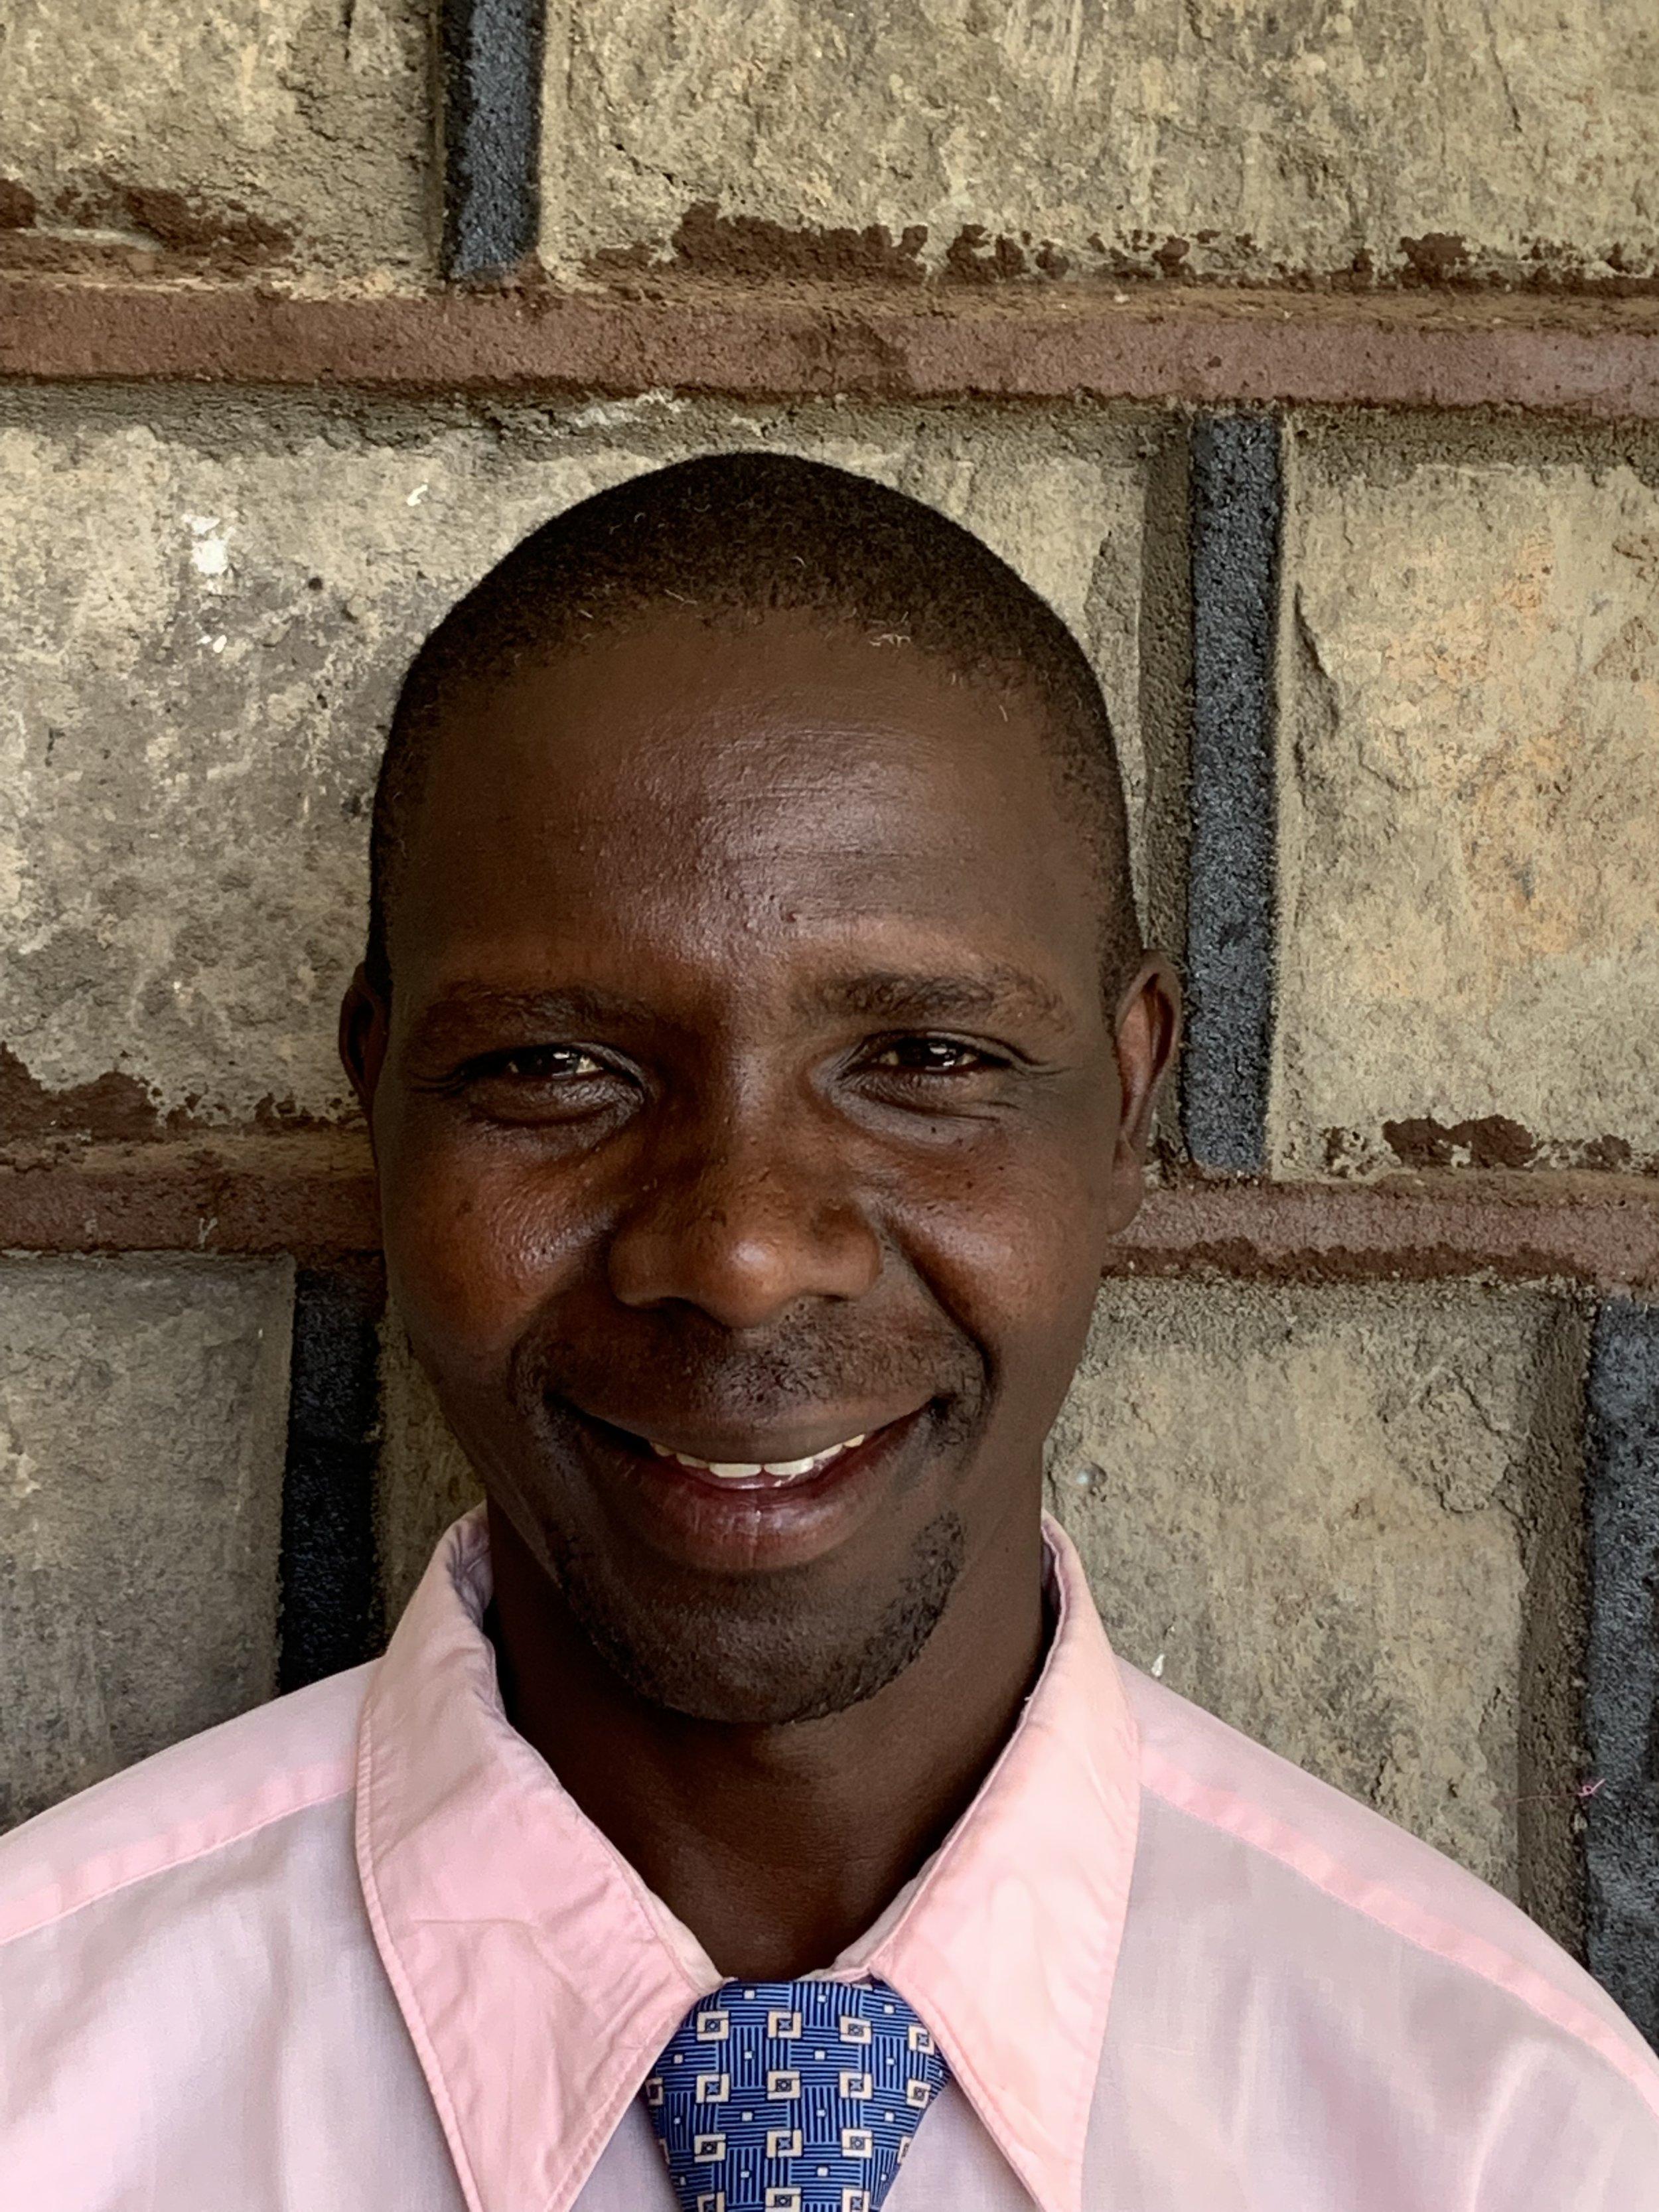 Joseph Sampoa - $150 Sponsorship